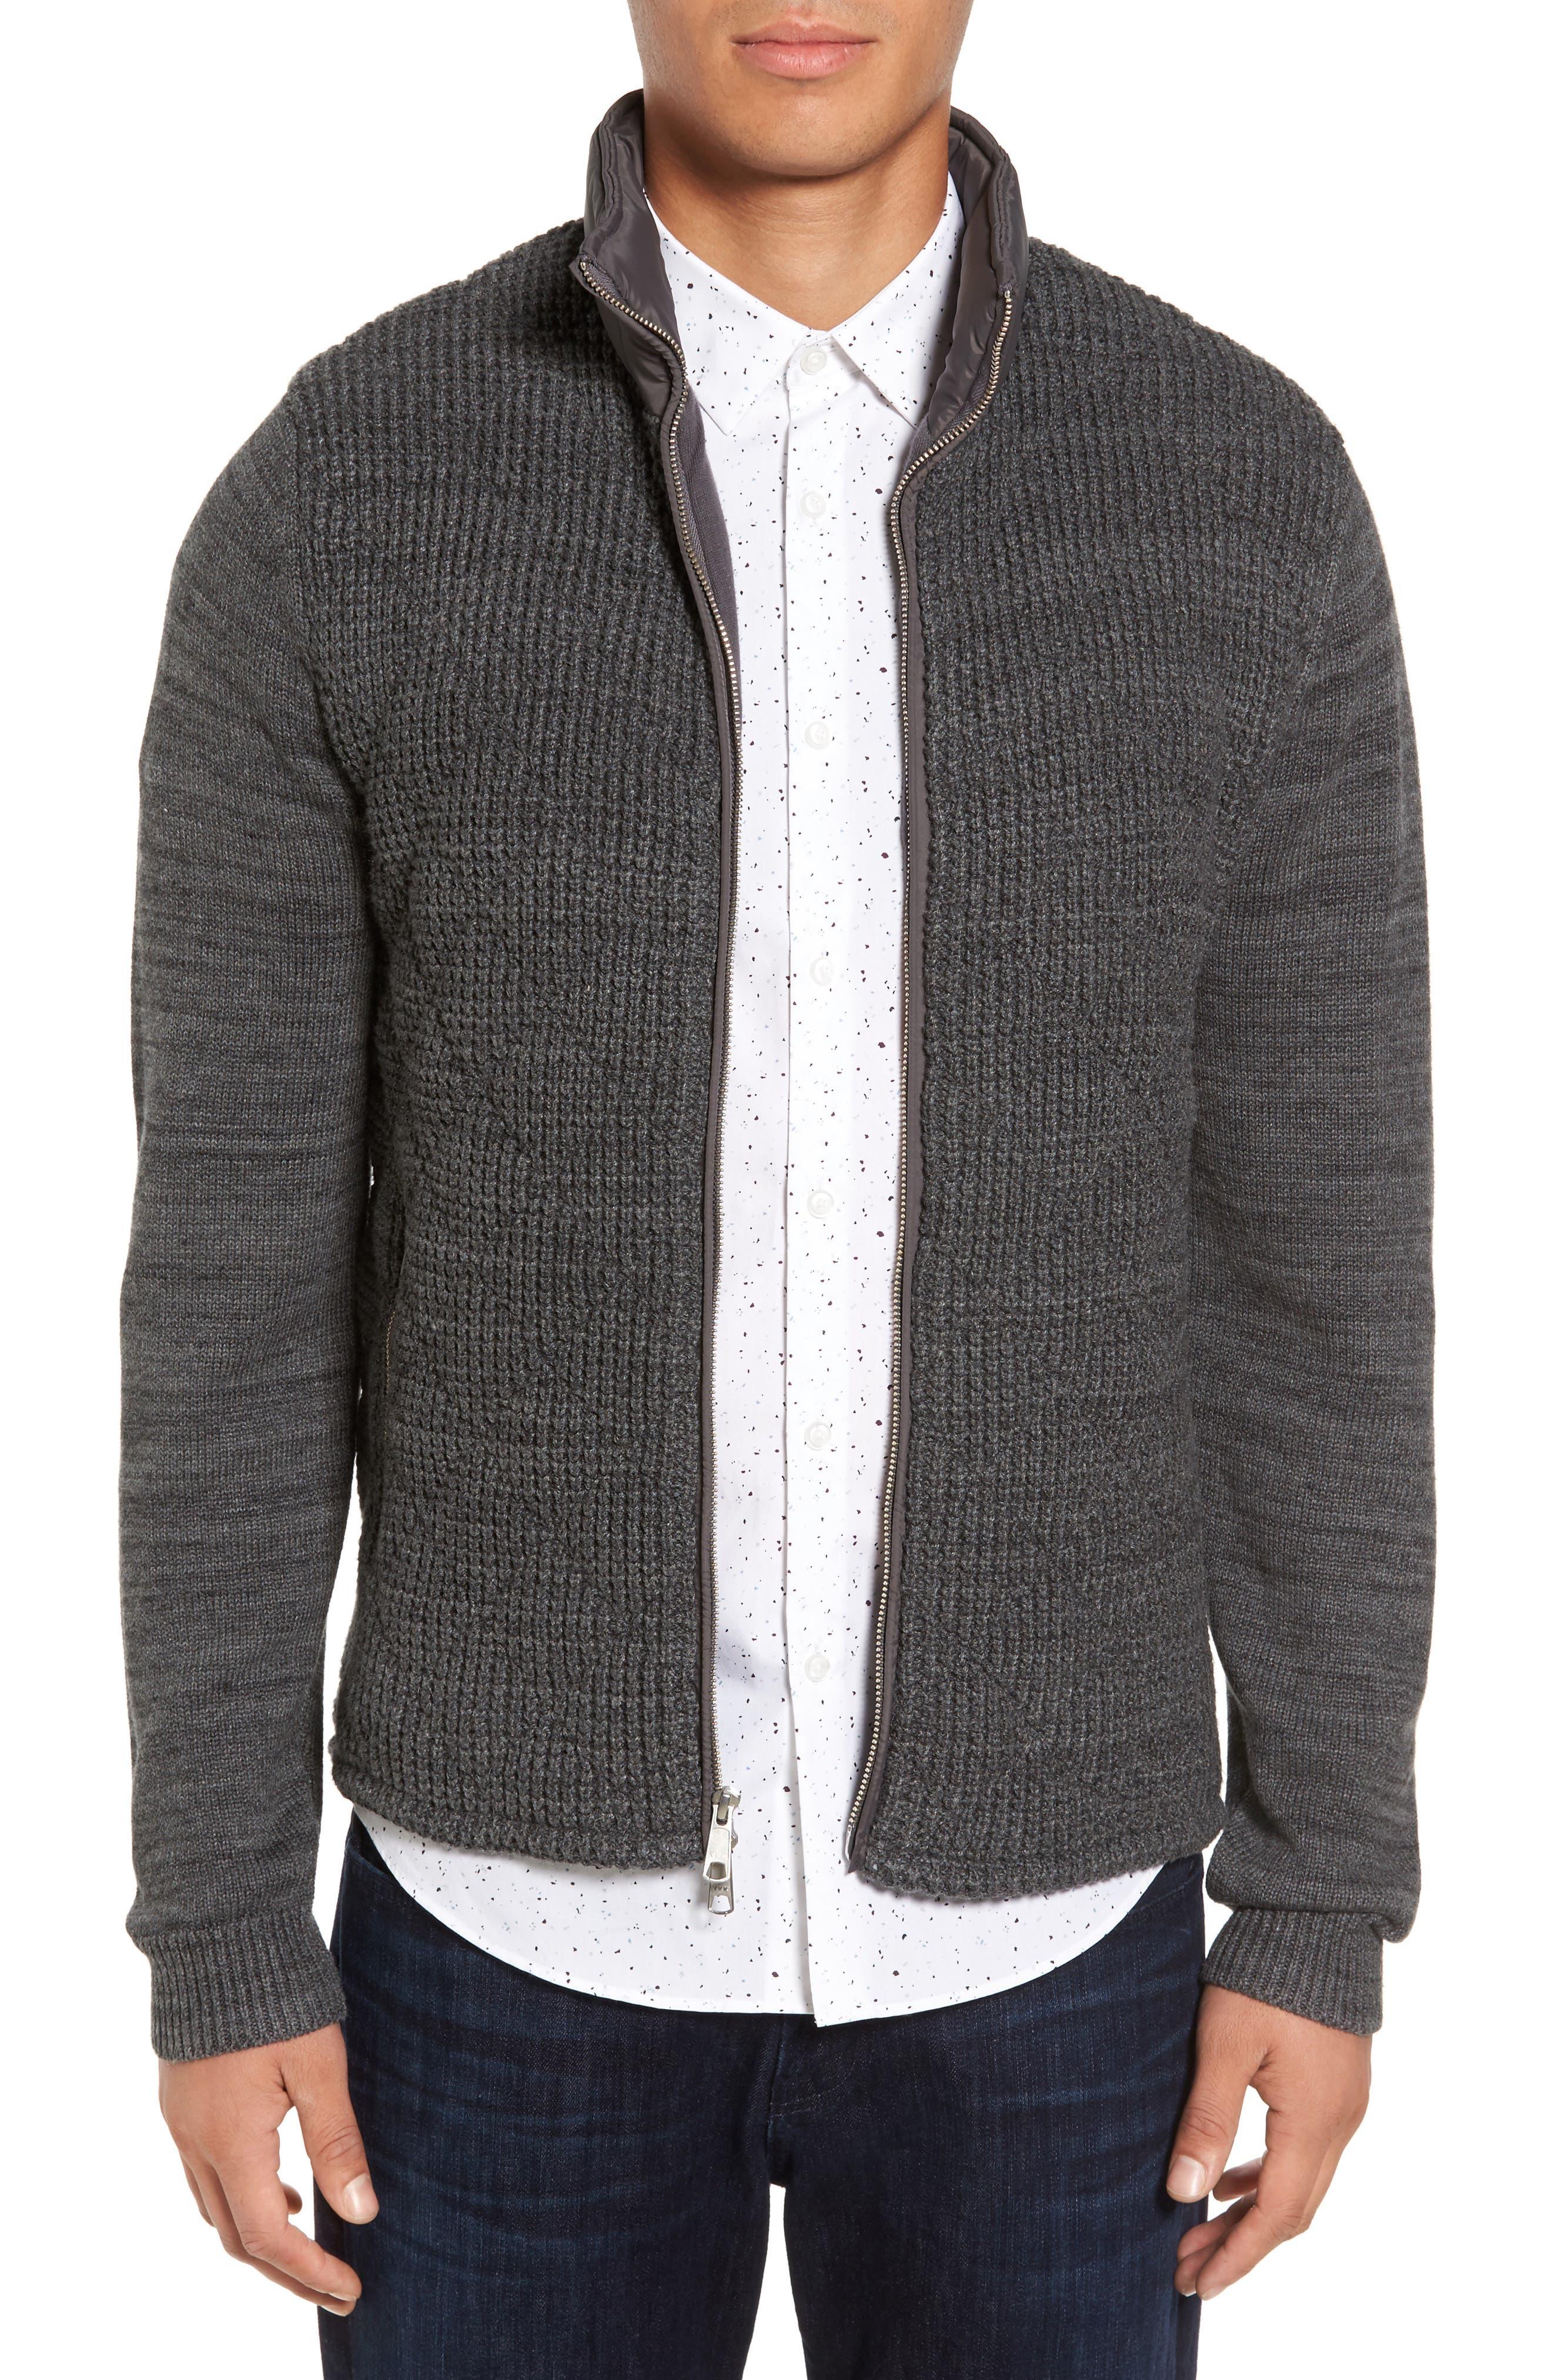 Mixed Media Full Zip Sweater,                             Main thumbnail 1, color,                             Grey Dark Charcoal Spacedye